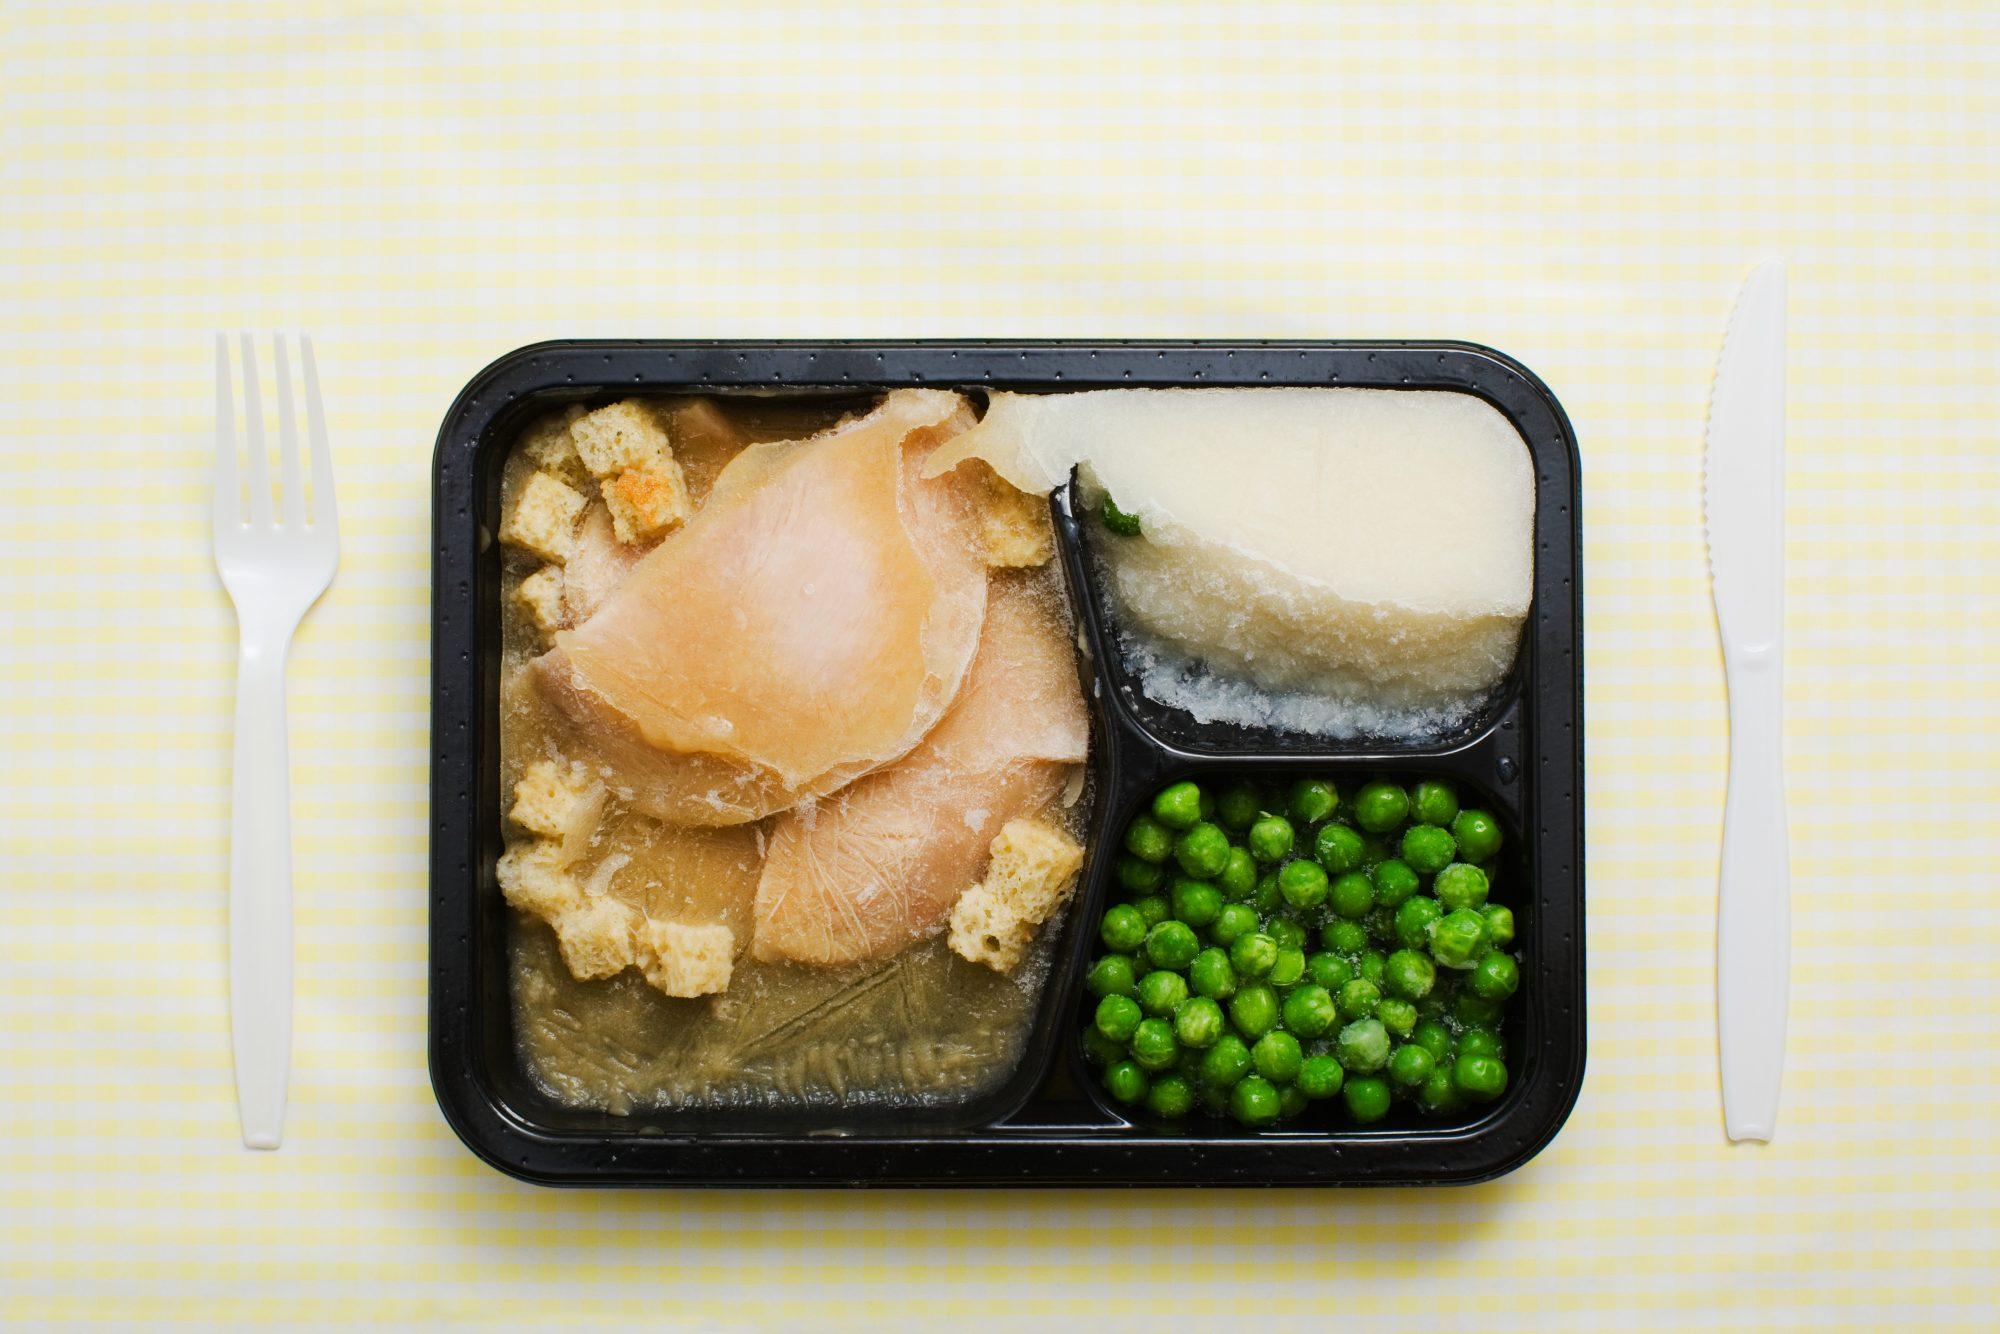 getty-frozen-dinner-image